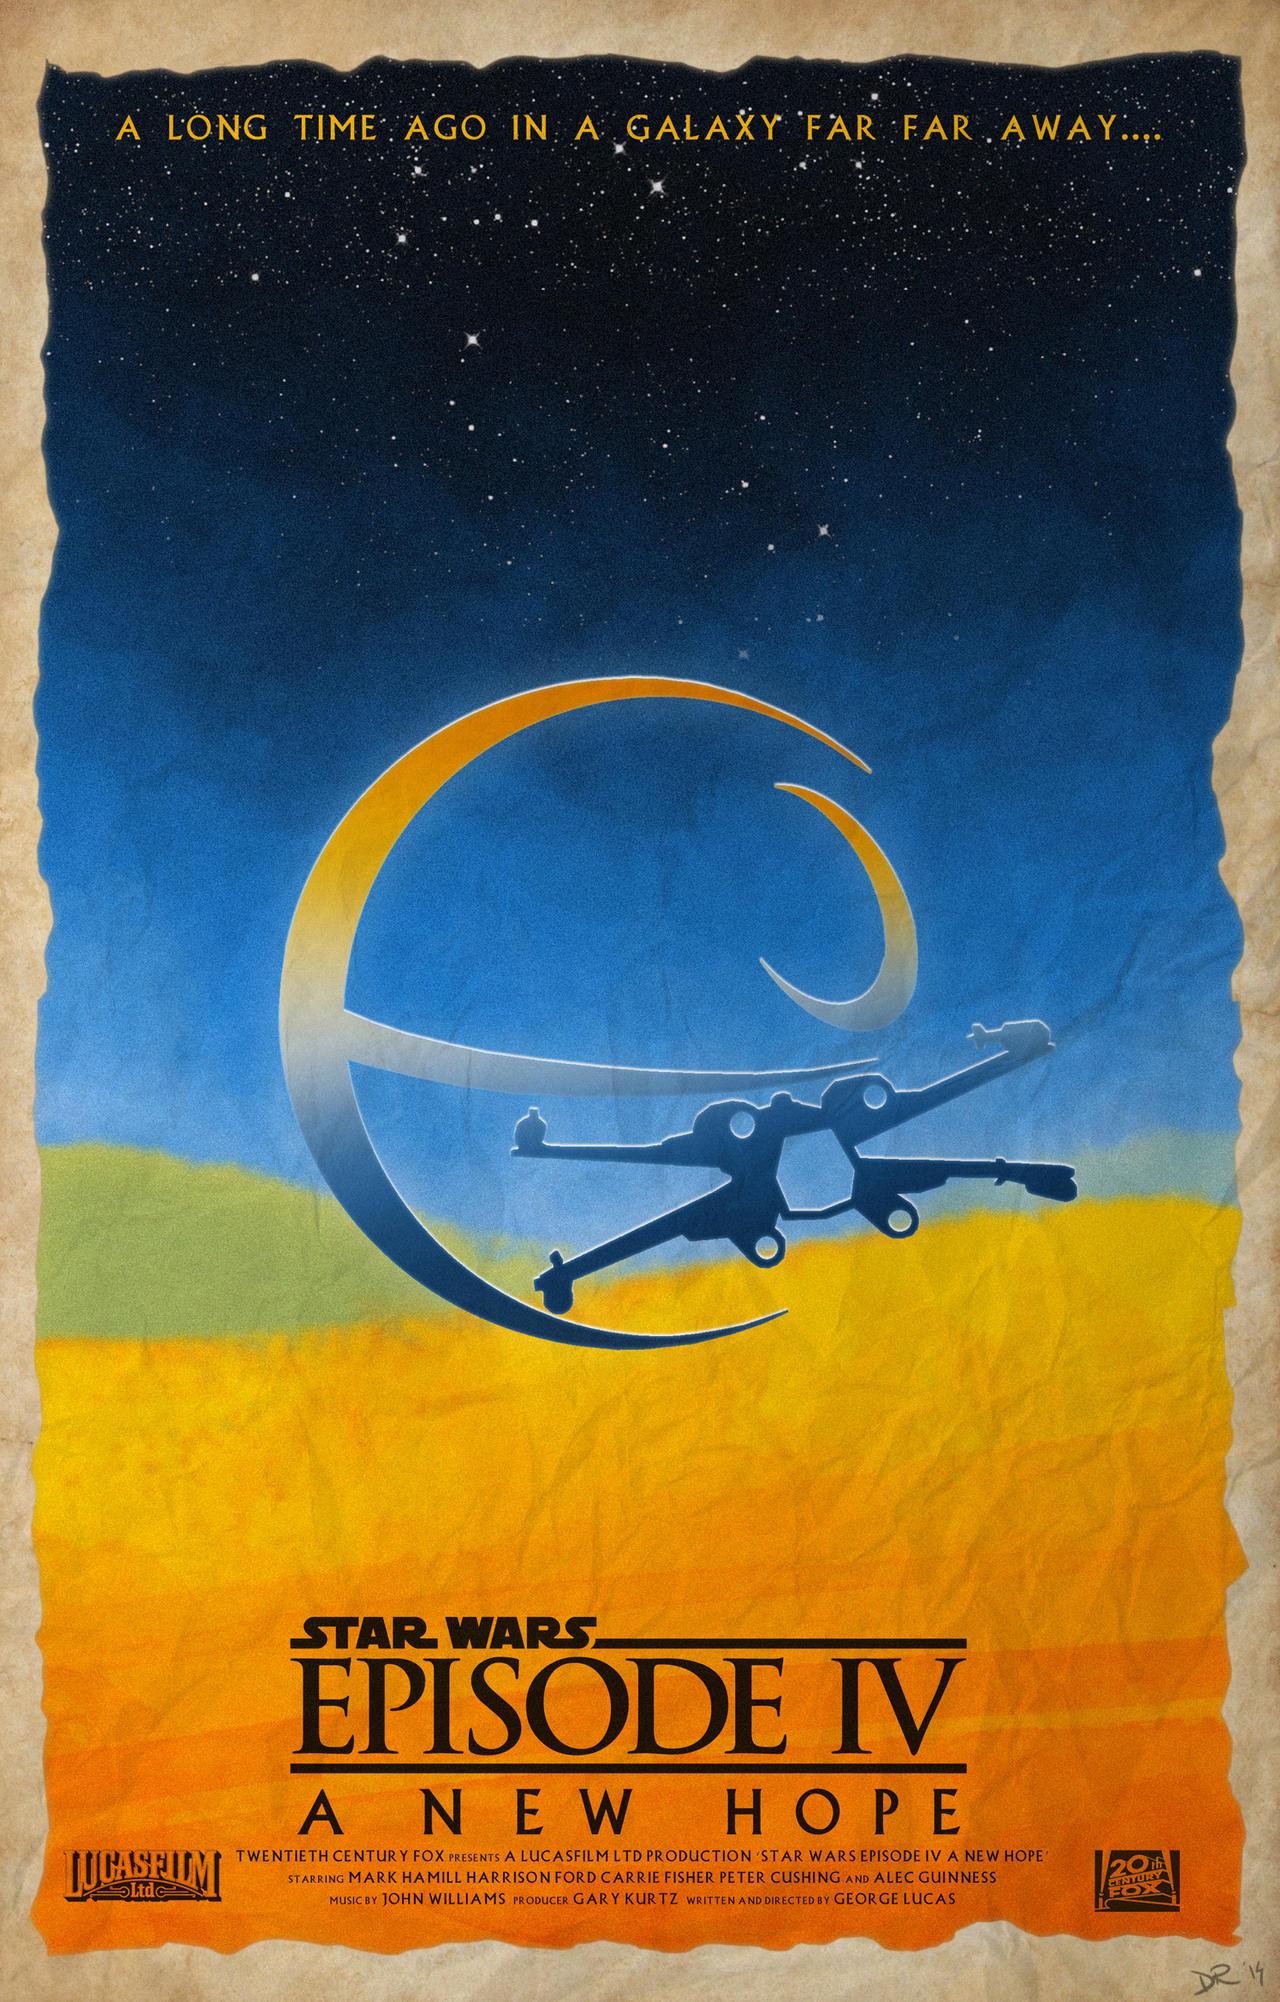 Star Wars Episode Iv A New Hope Poster By Danieleredrossini On Deviantart